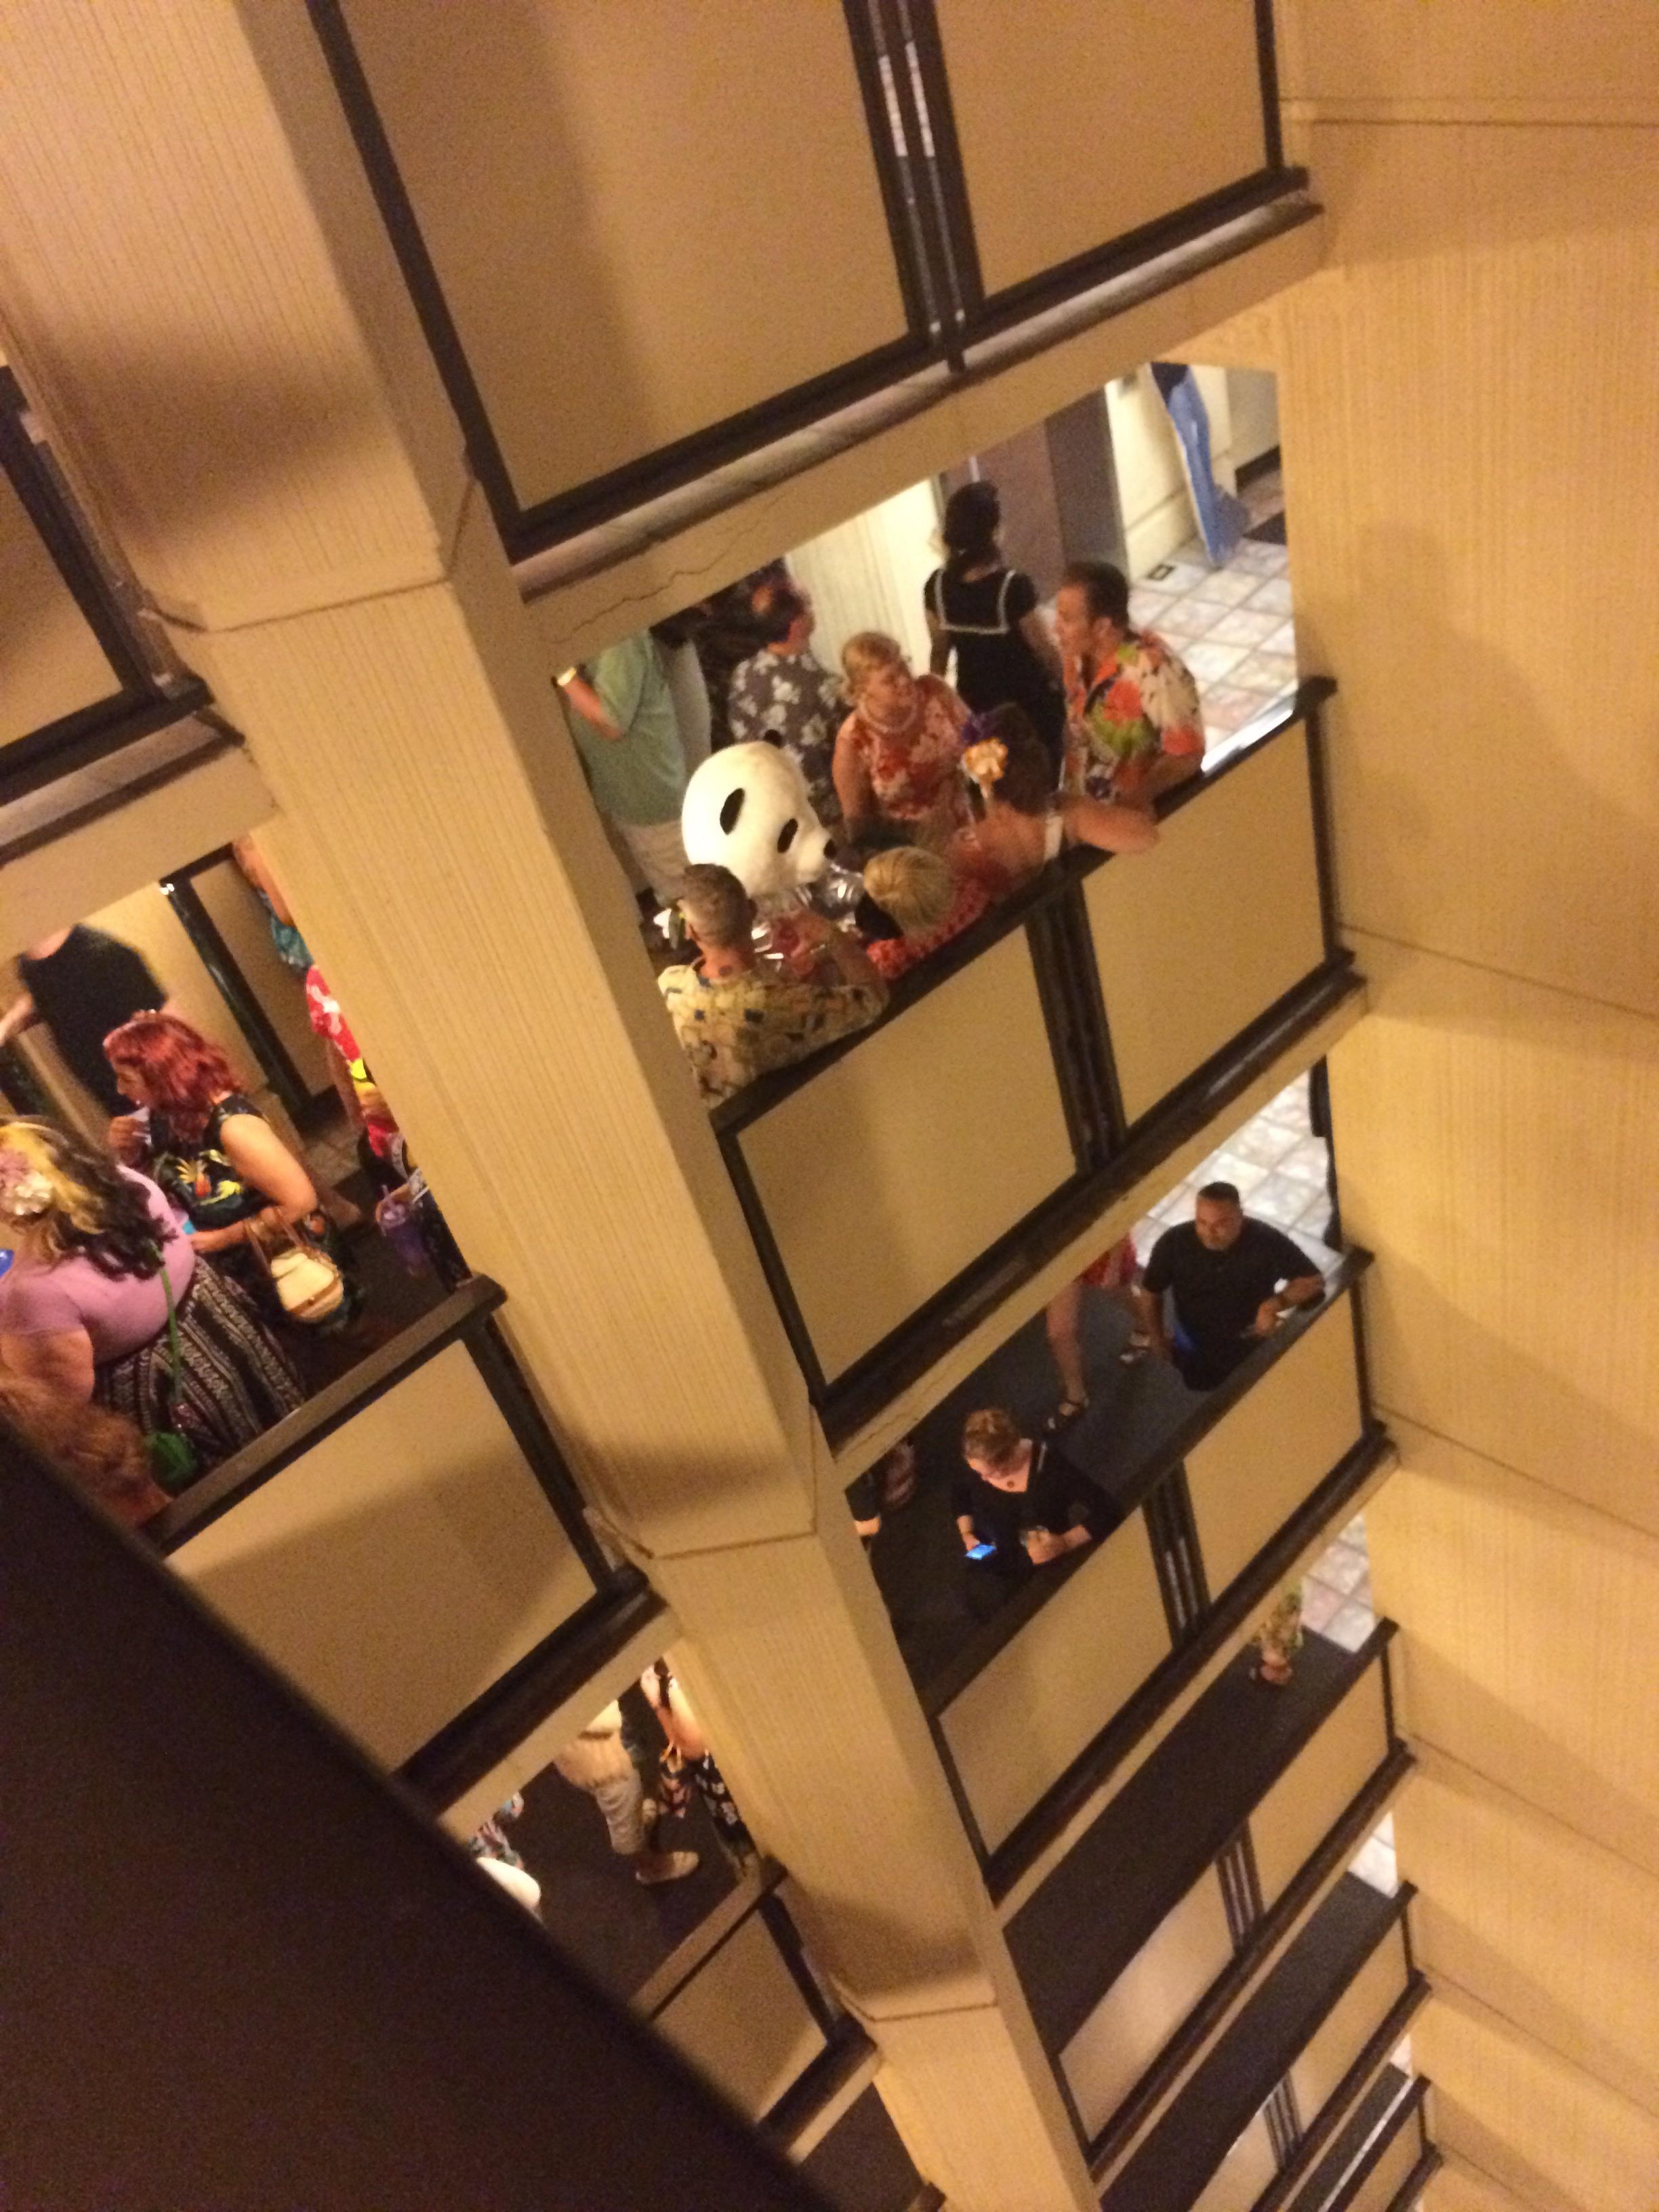 tiki-oasis-room-party-crowds.jpg